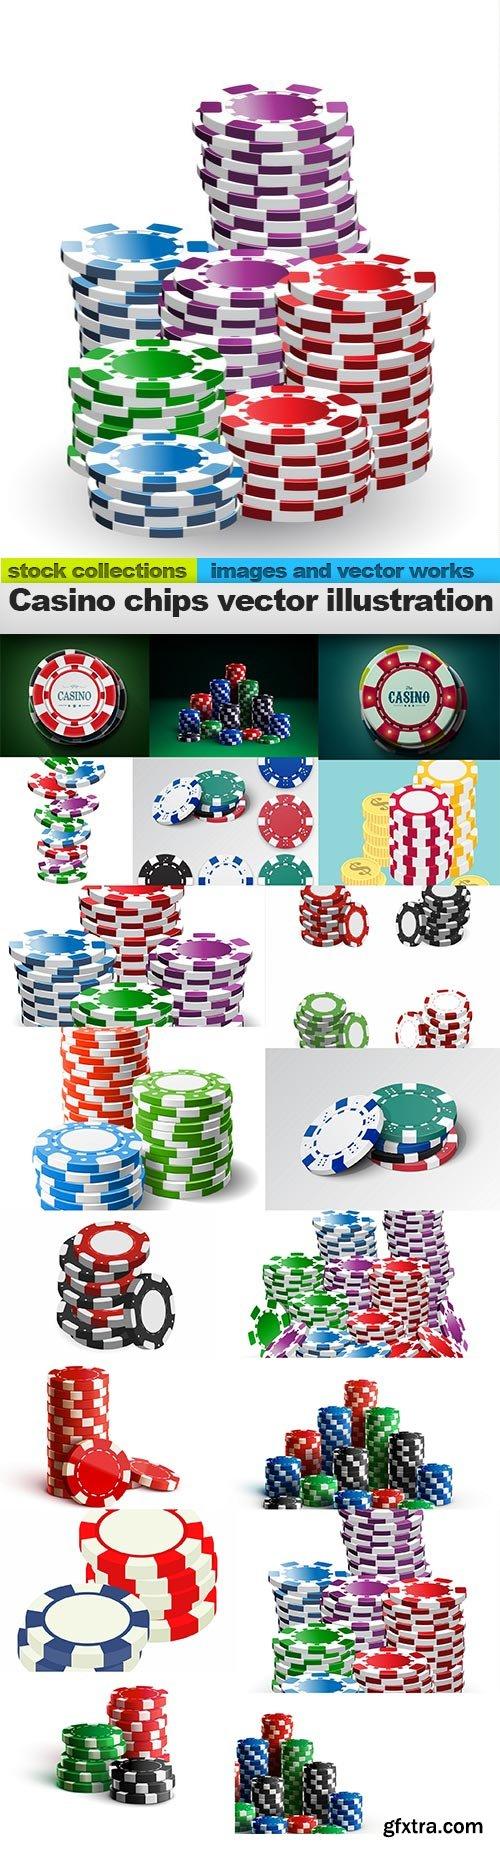 Casino chips vector illustration, 15 x EPS